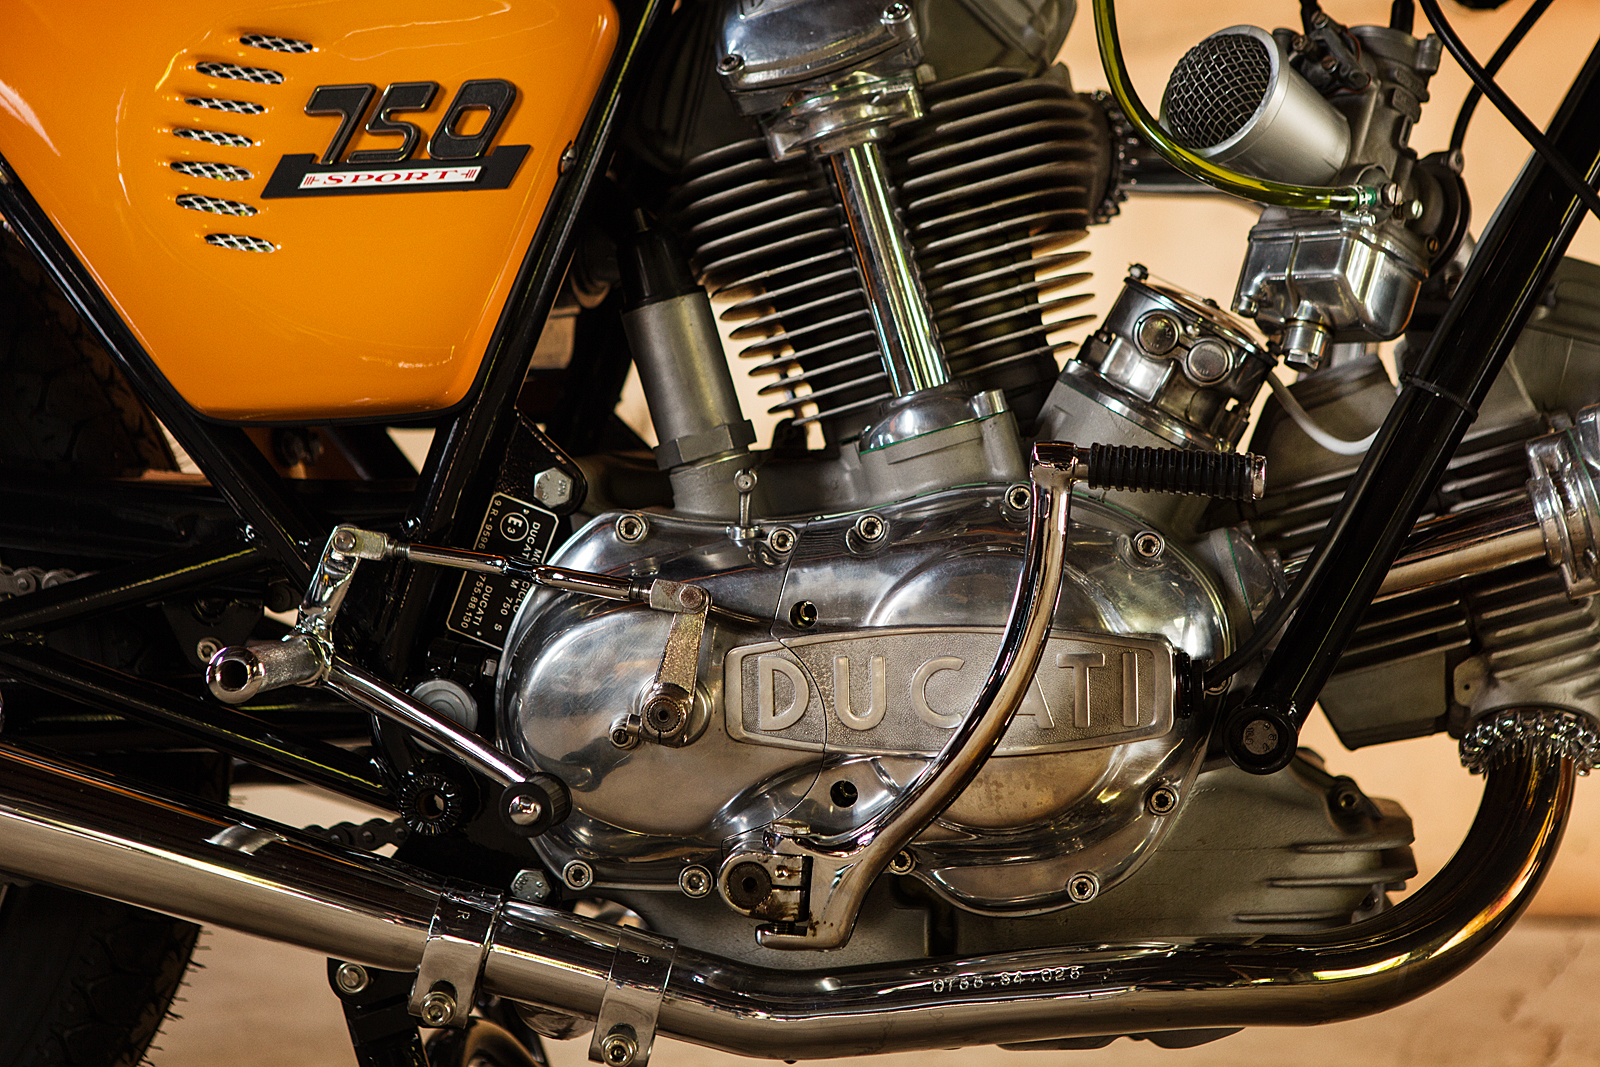 1974 Ducati 750S Sport motor round case